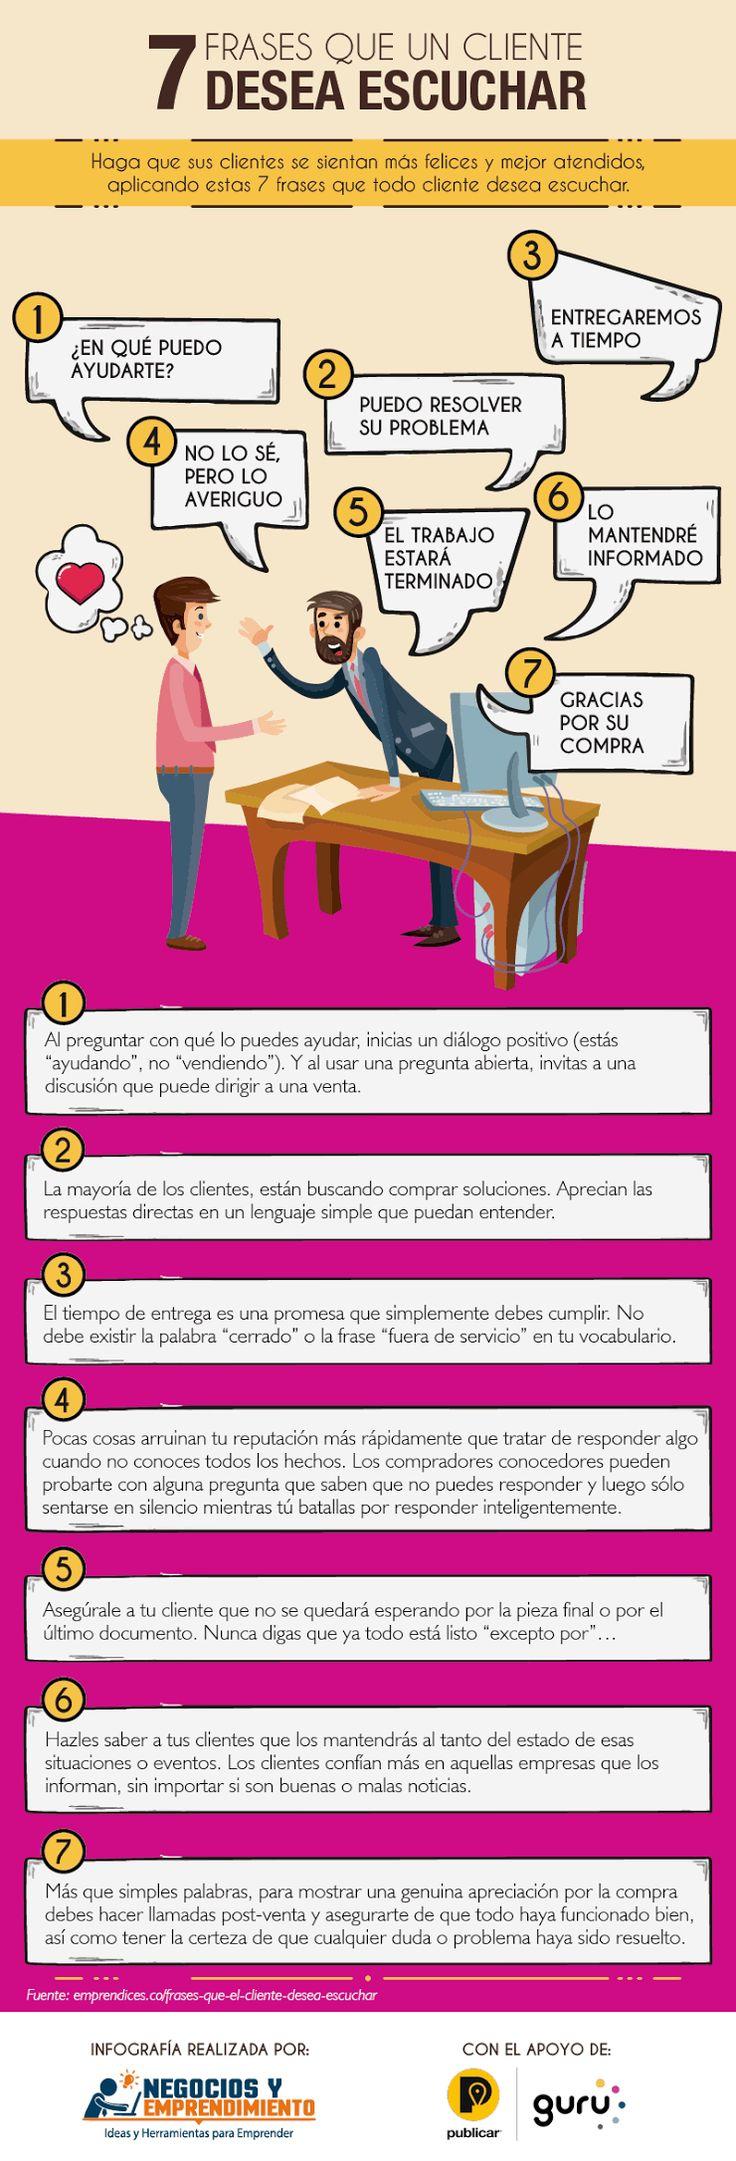 7 frases que tu cliente quiere escuchar #infografia